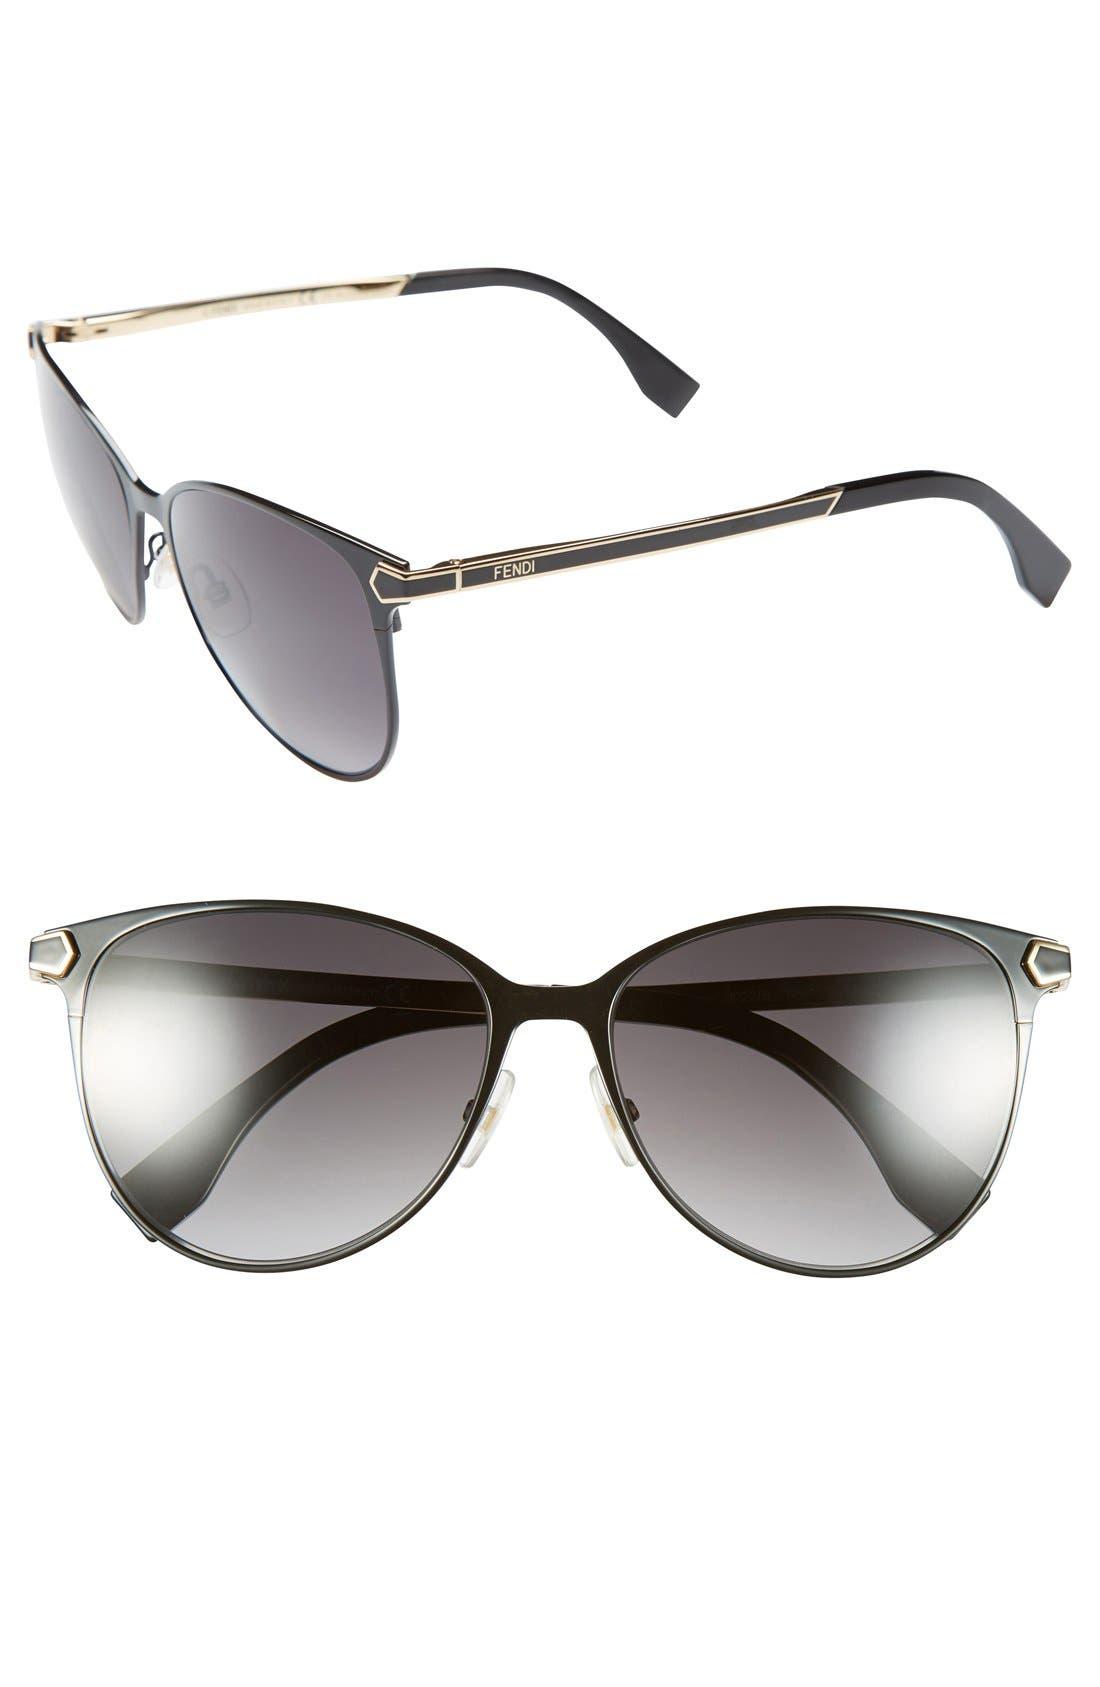 Alternate Image 1 Selected - Fendi 57mm Retro Sunglasses